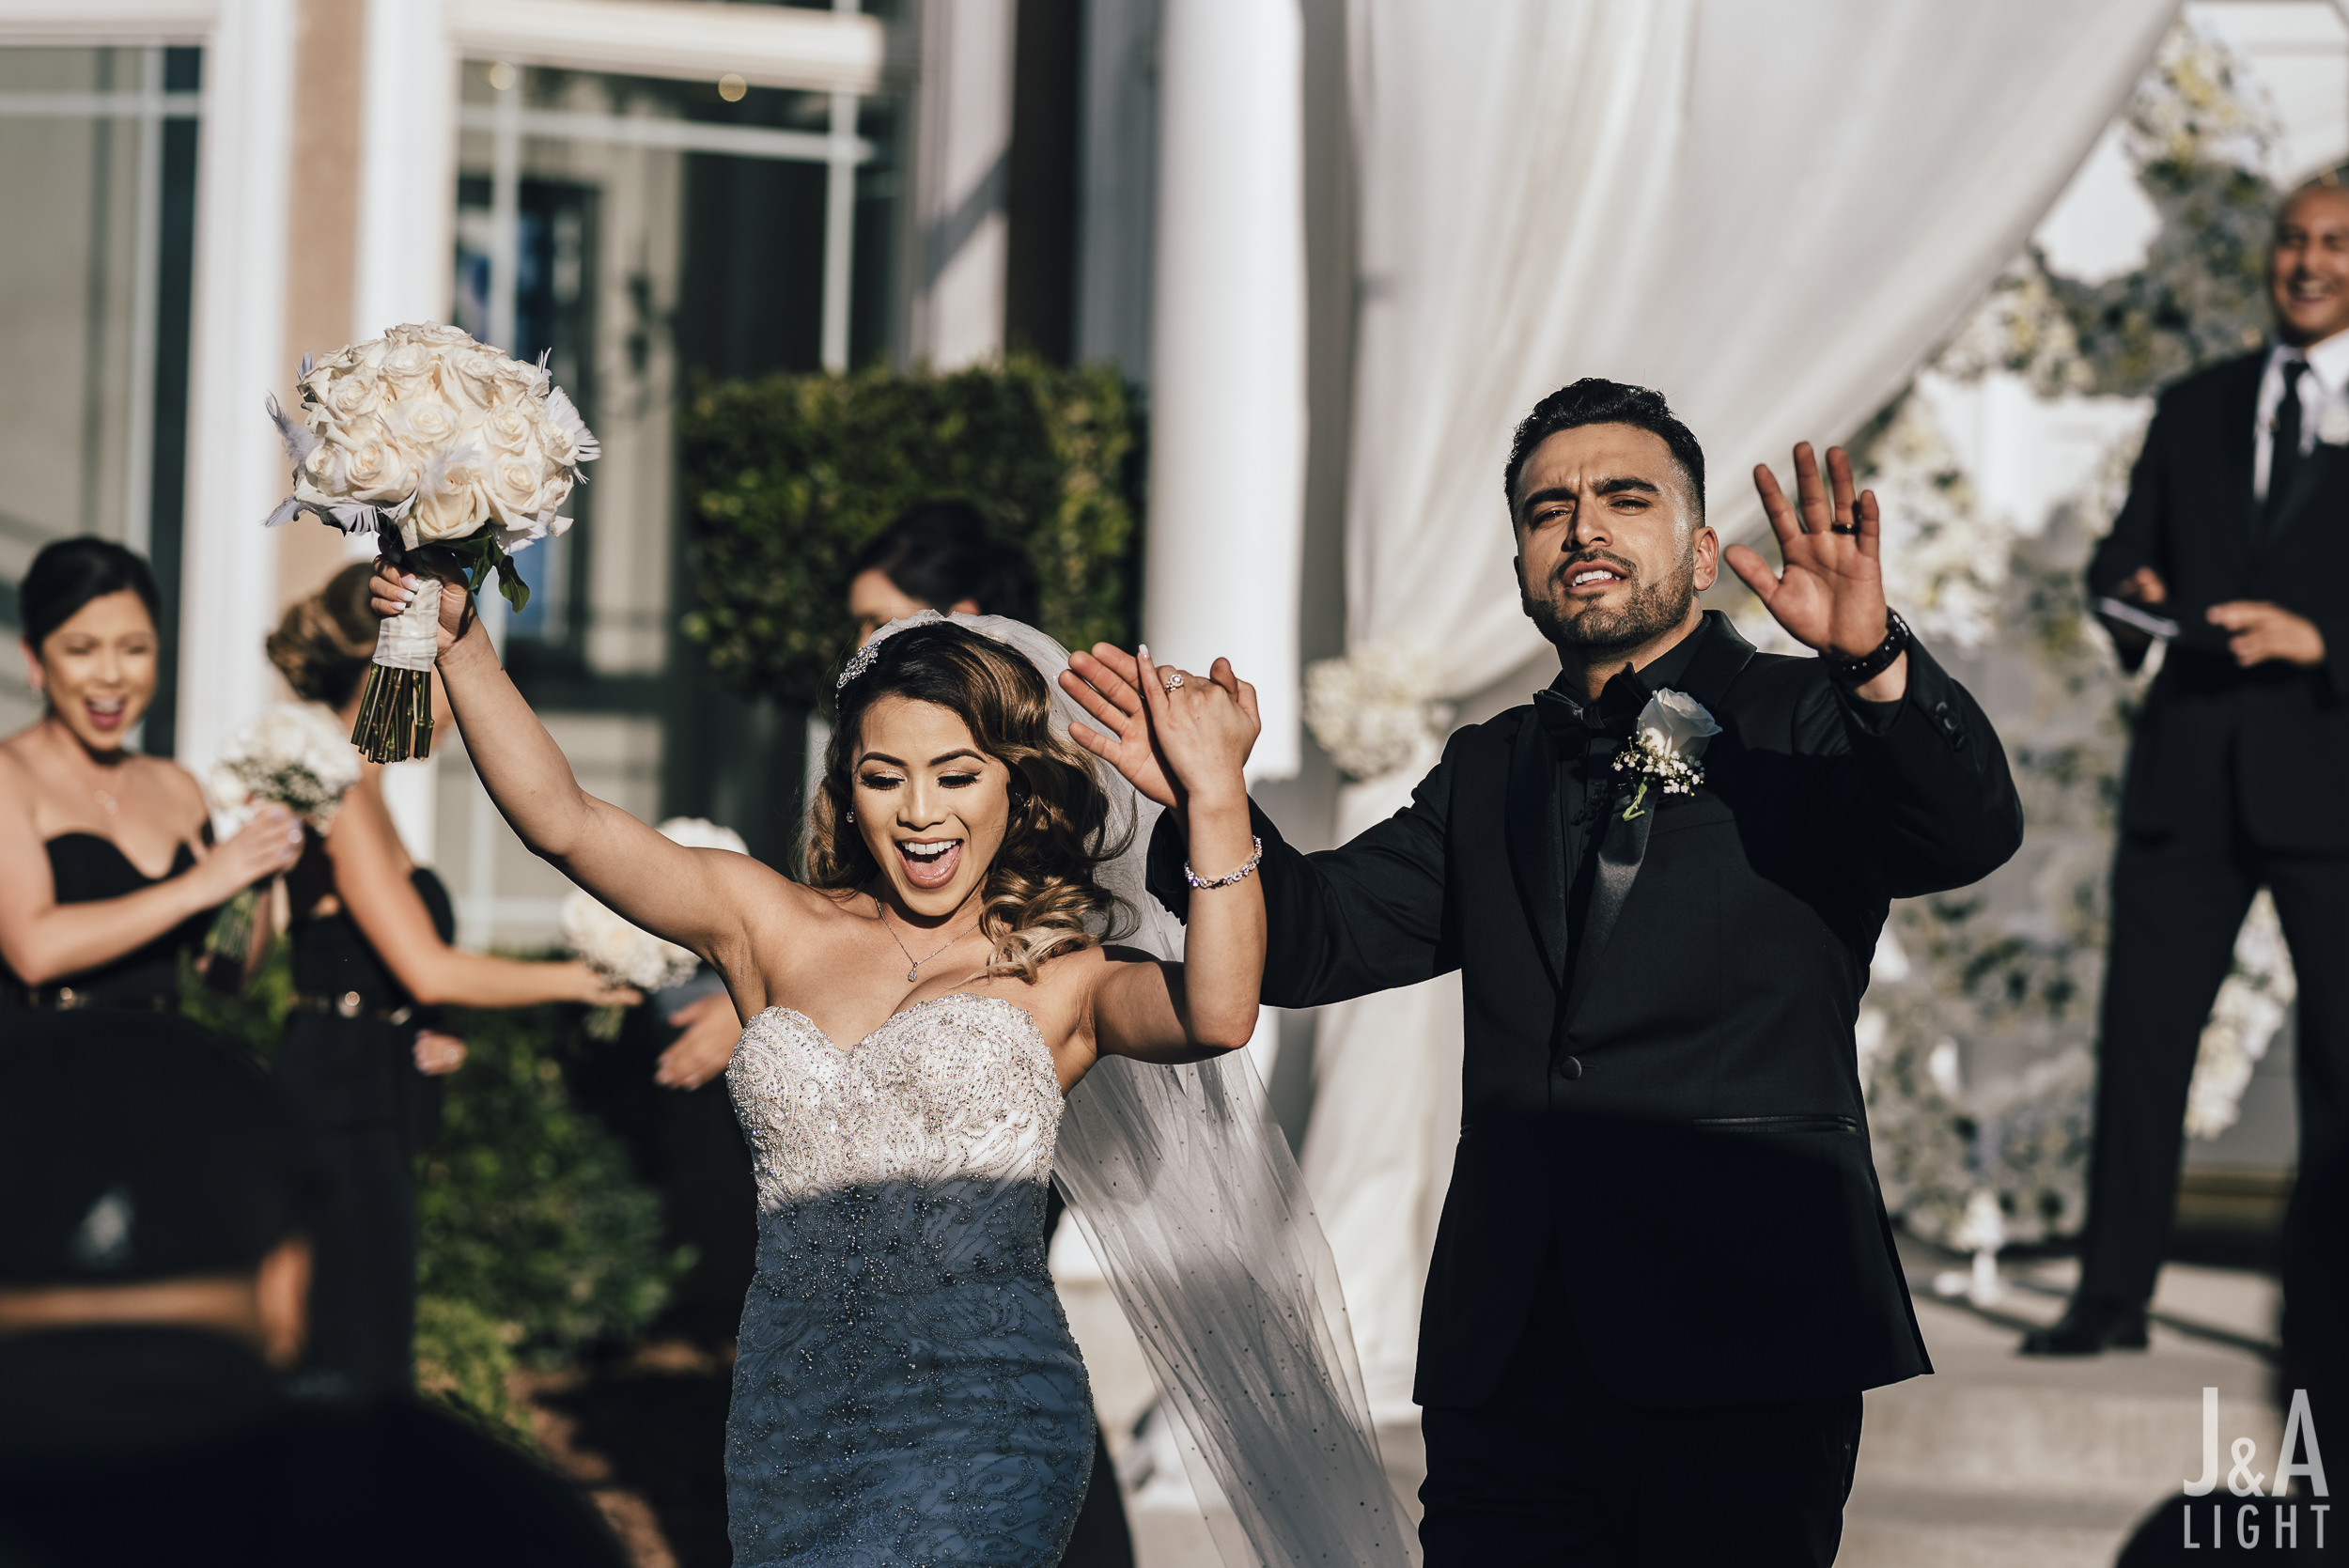 20171014-JanDan-LosBanos-GlassMansion-Wedding-Blog-043.jpg